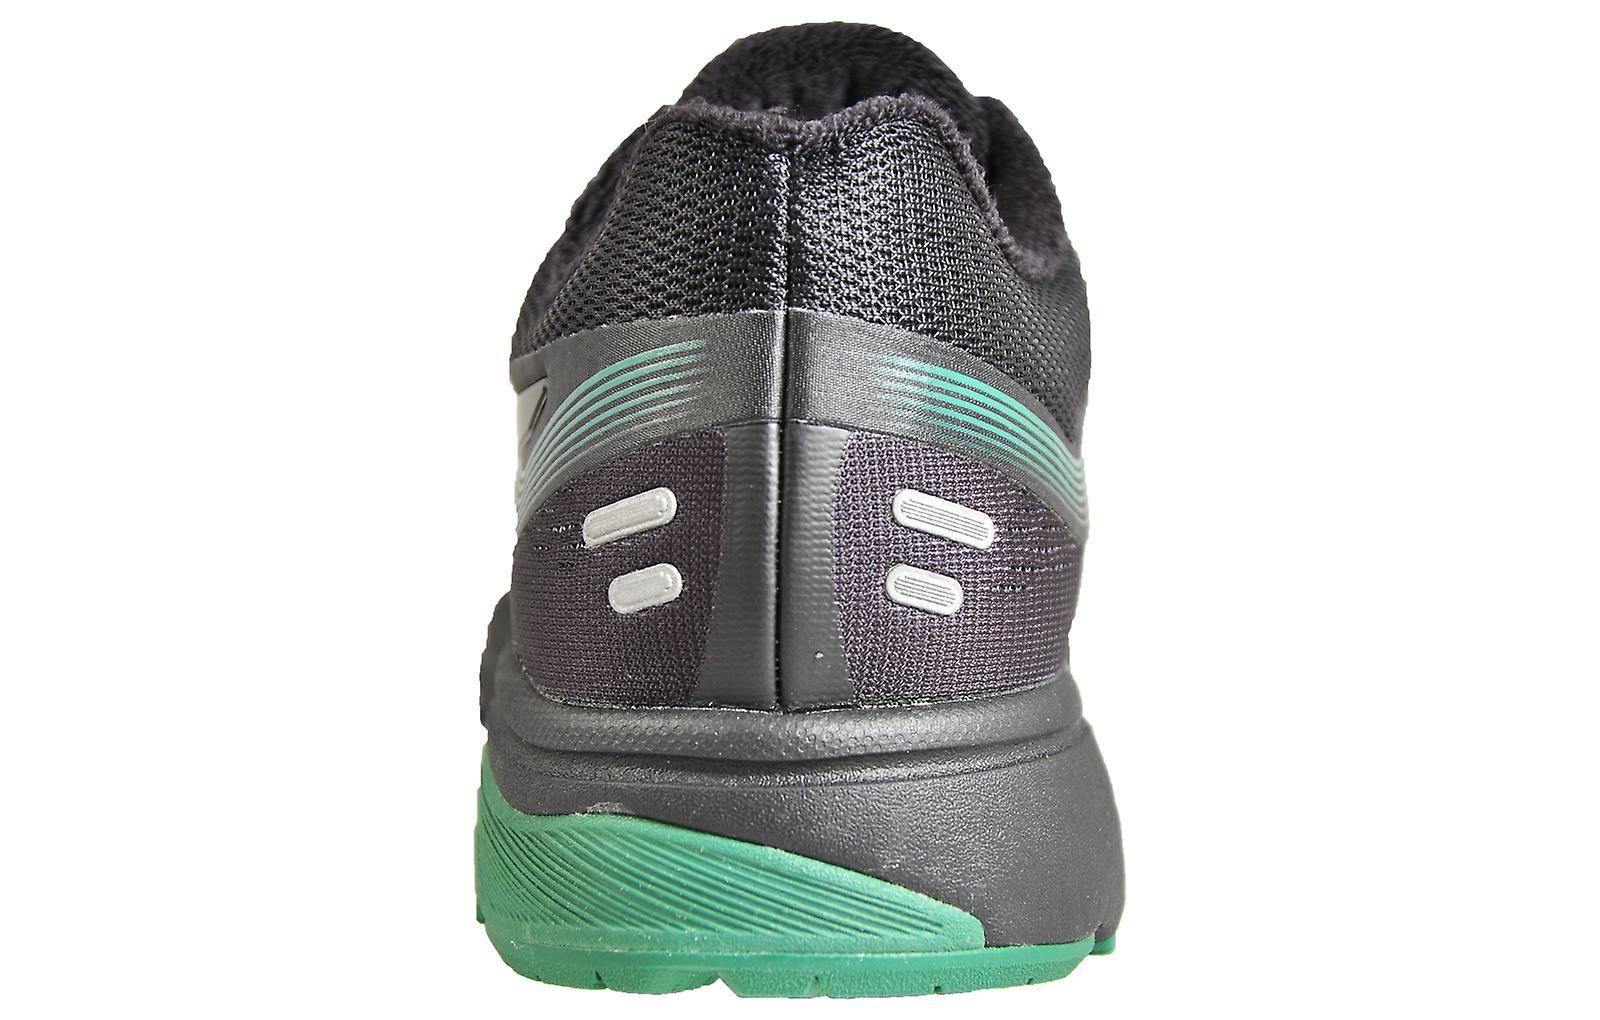 Asics GT-1000 7 SP Neon Black / Lime